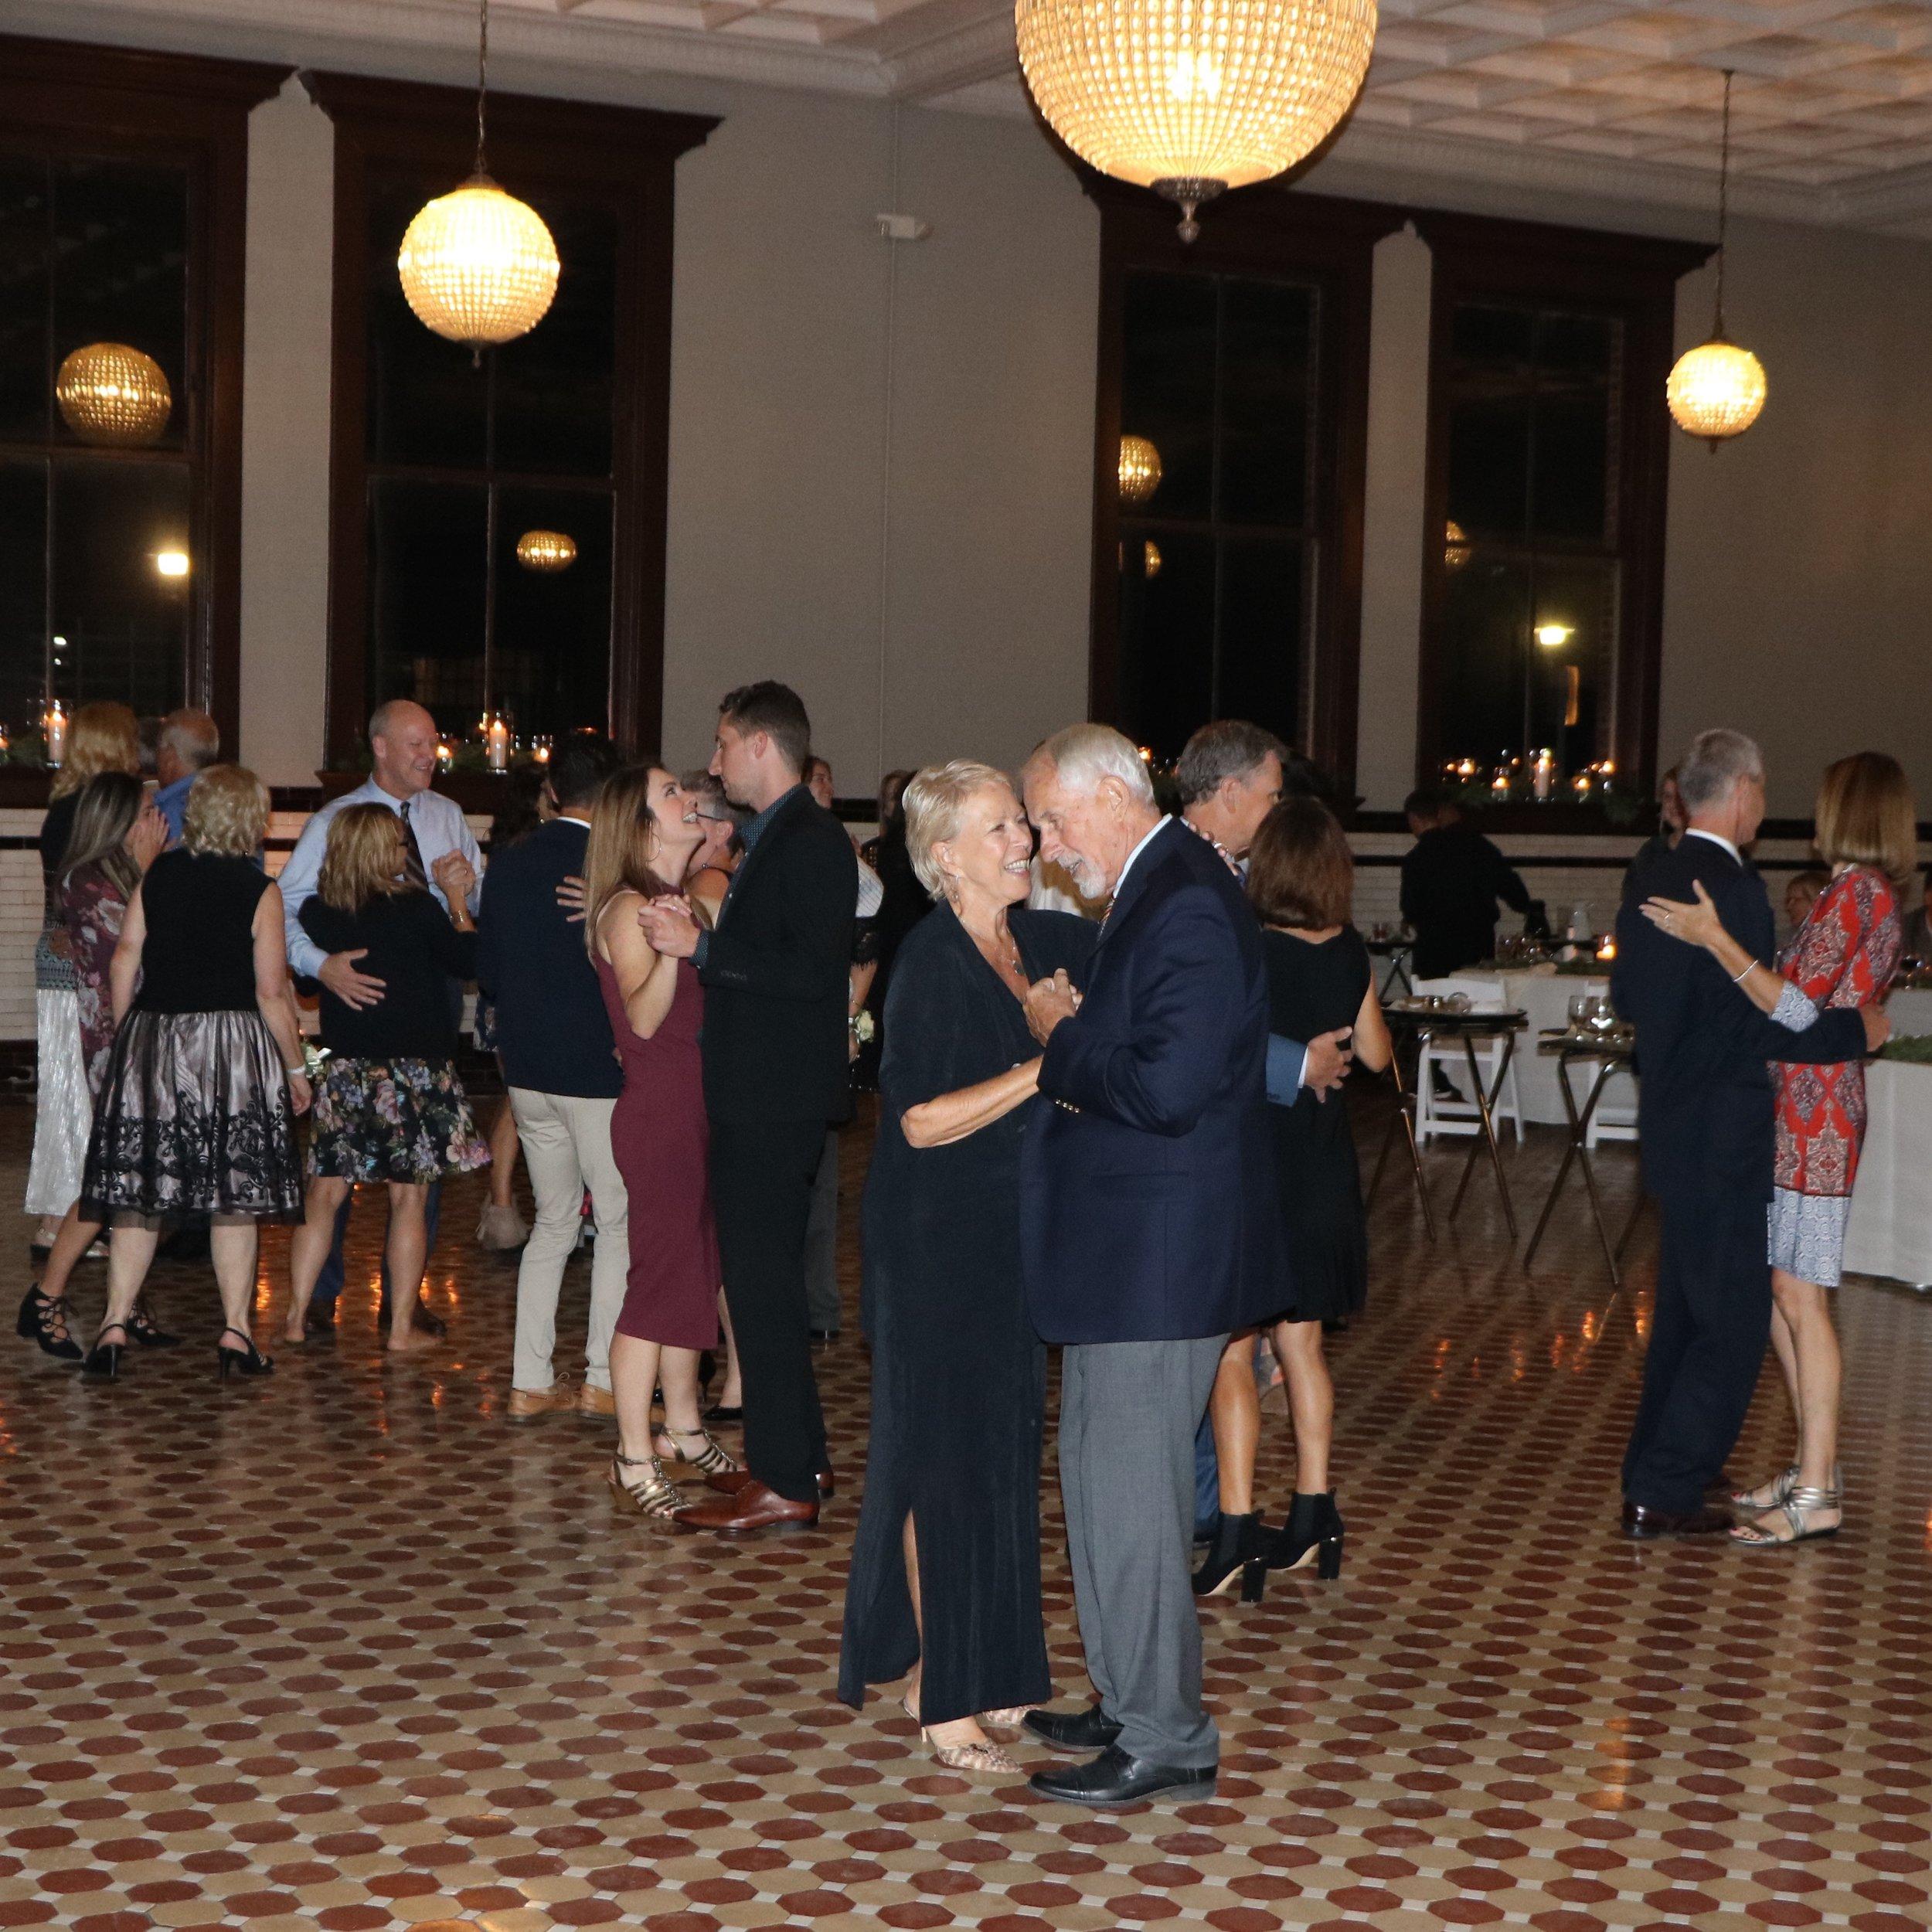 Katy & Alex open dancing by Jim Cerone